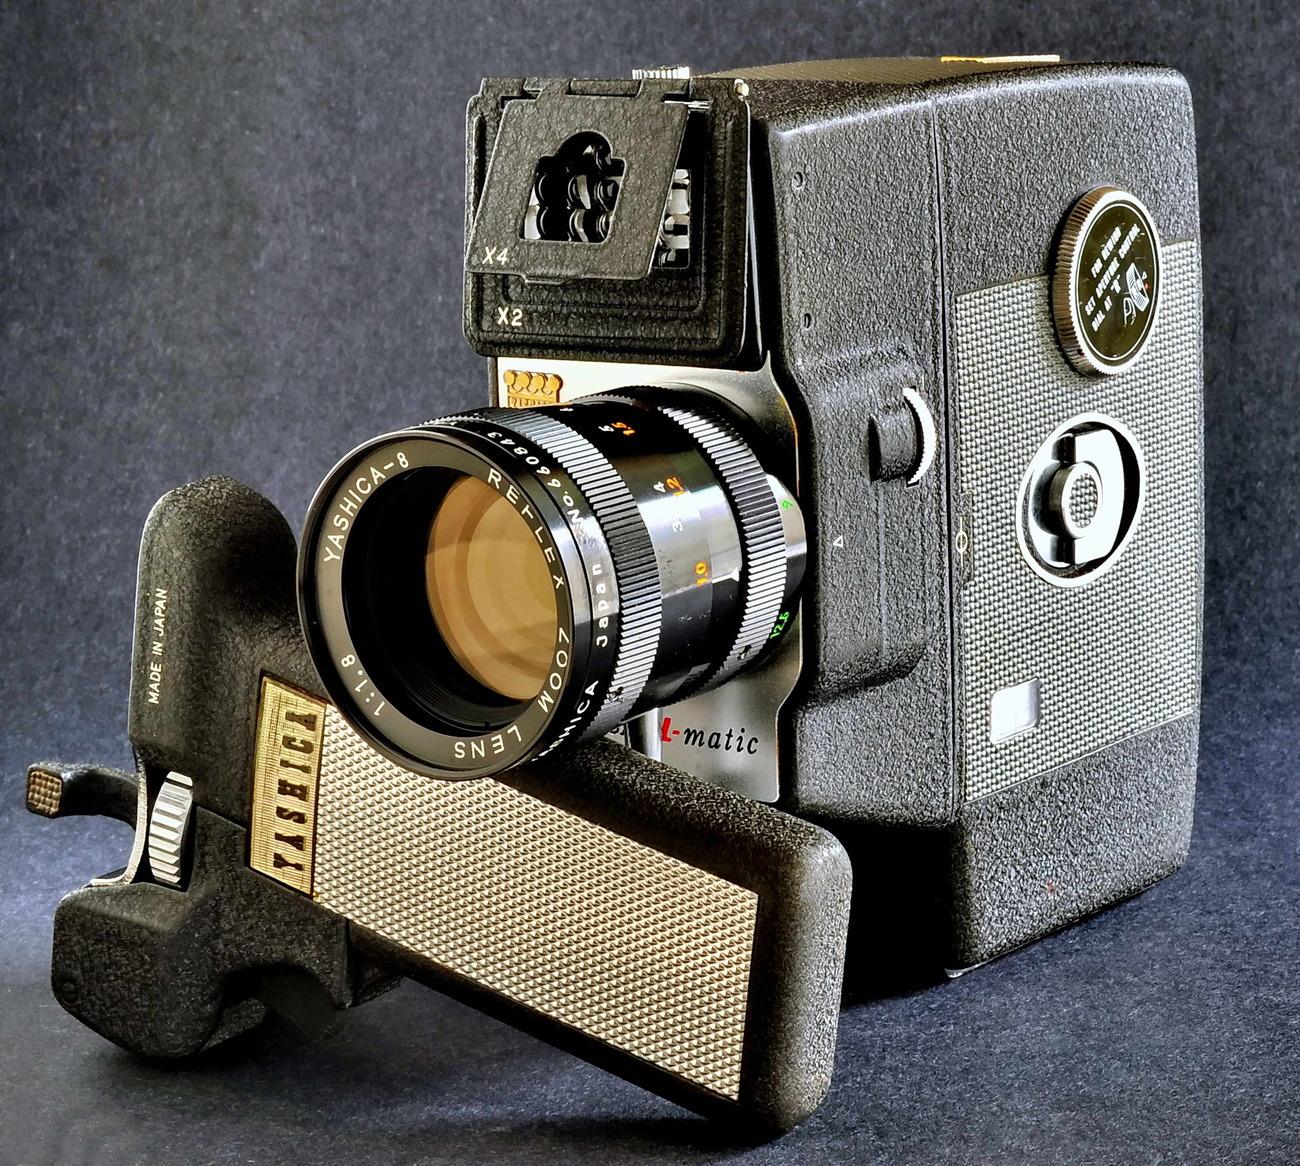 Yashica 8 u matic yashinon 9 28 f1.8 reflex zoom lens w handle.2.small file